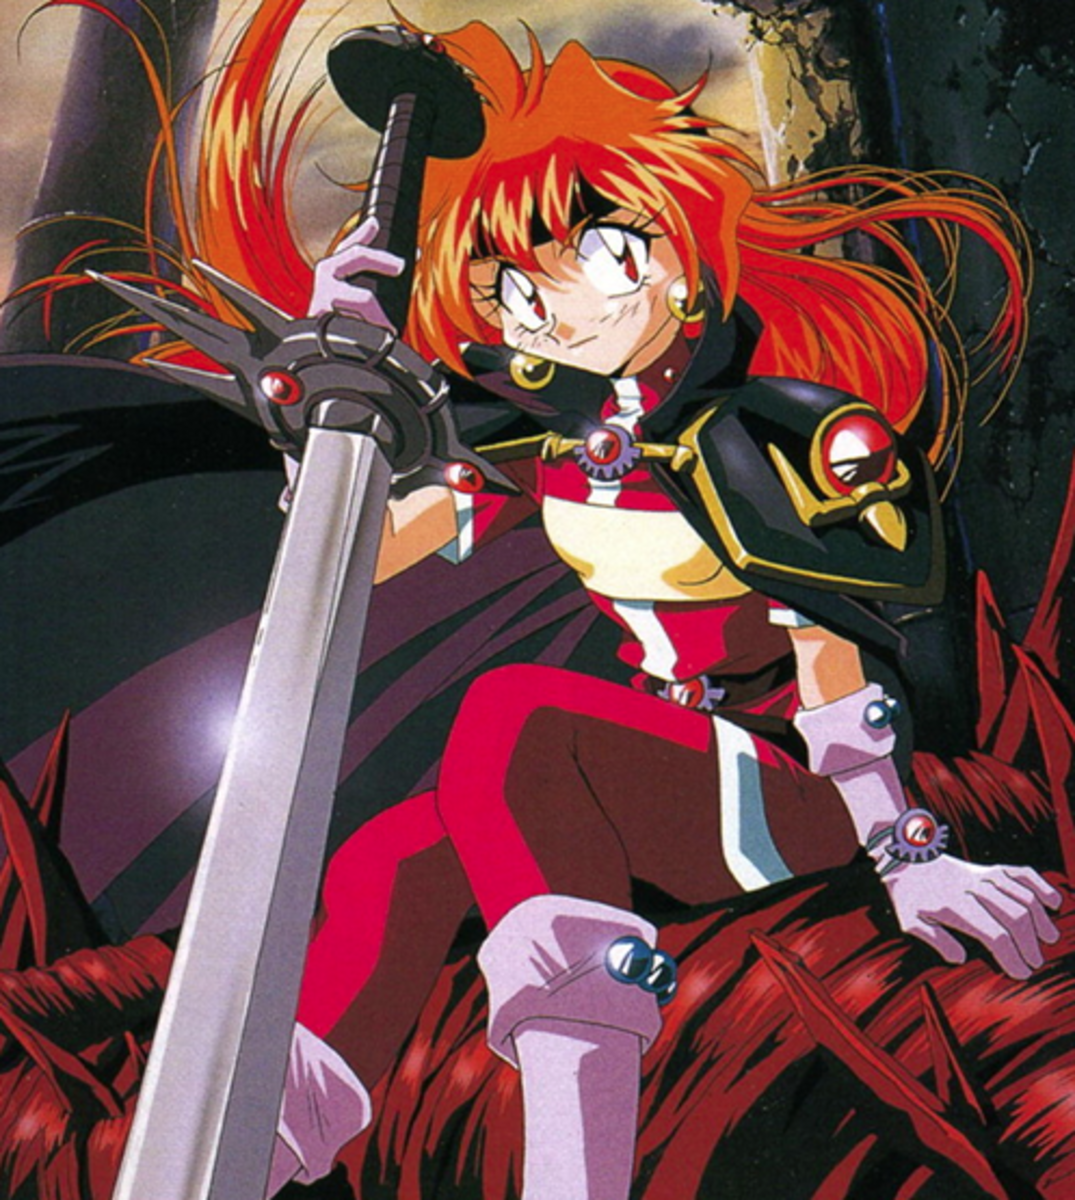 Lina Inverse of 'Slayers'.